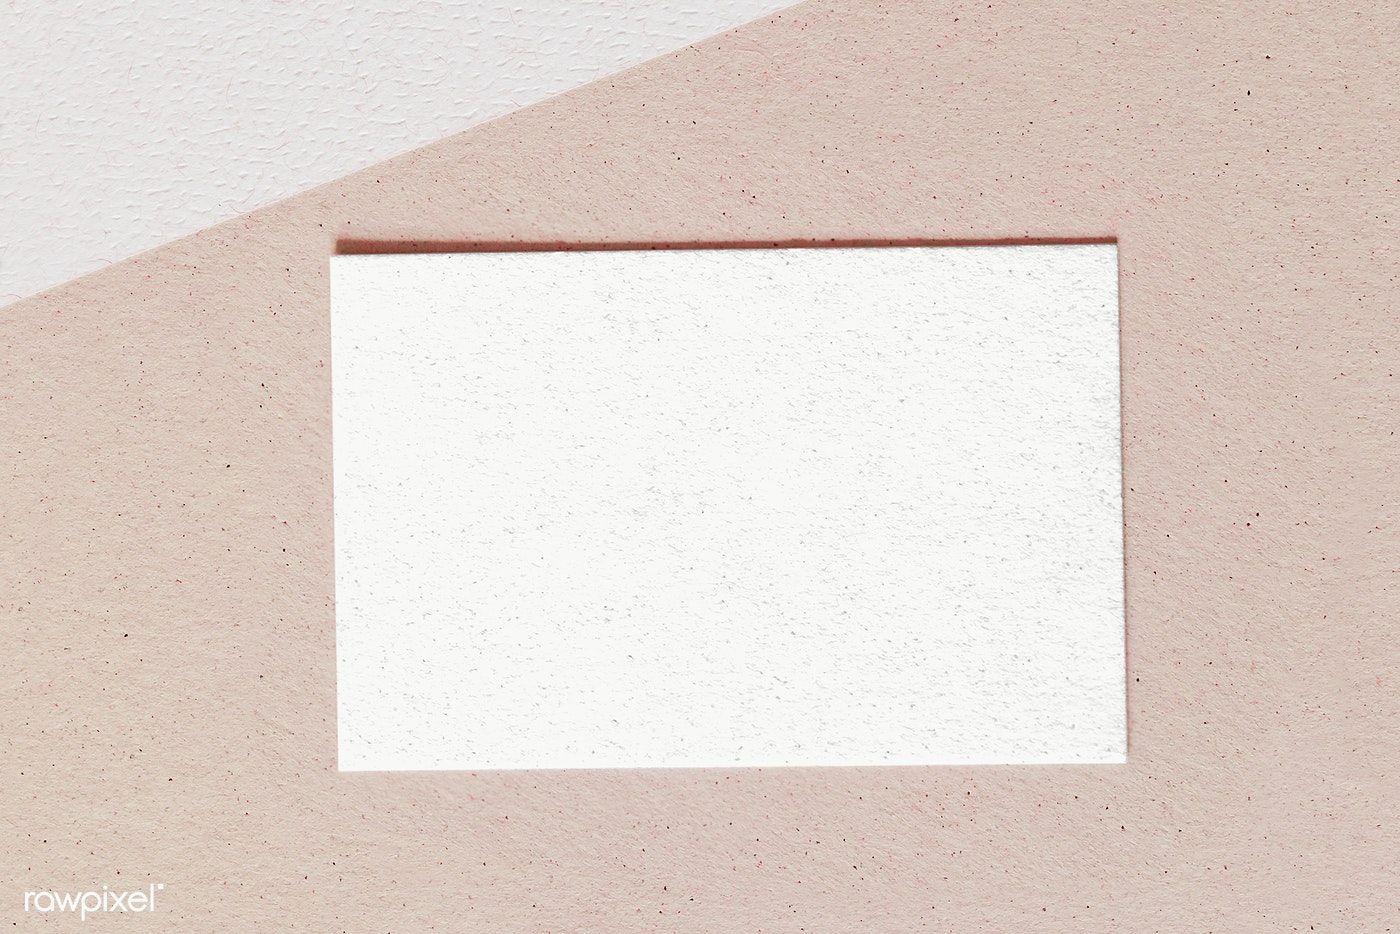 Blank Card Transparent Png Premium Image By Rawpixel Com Karolina Kaboompics Blank Cards Business Card Design Minimal Blue Business Card